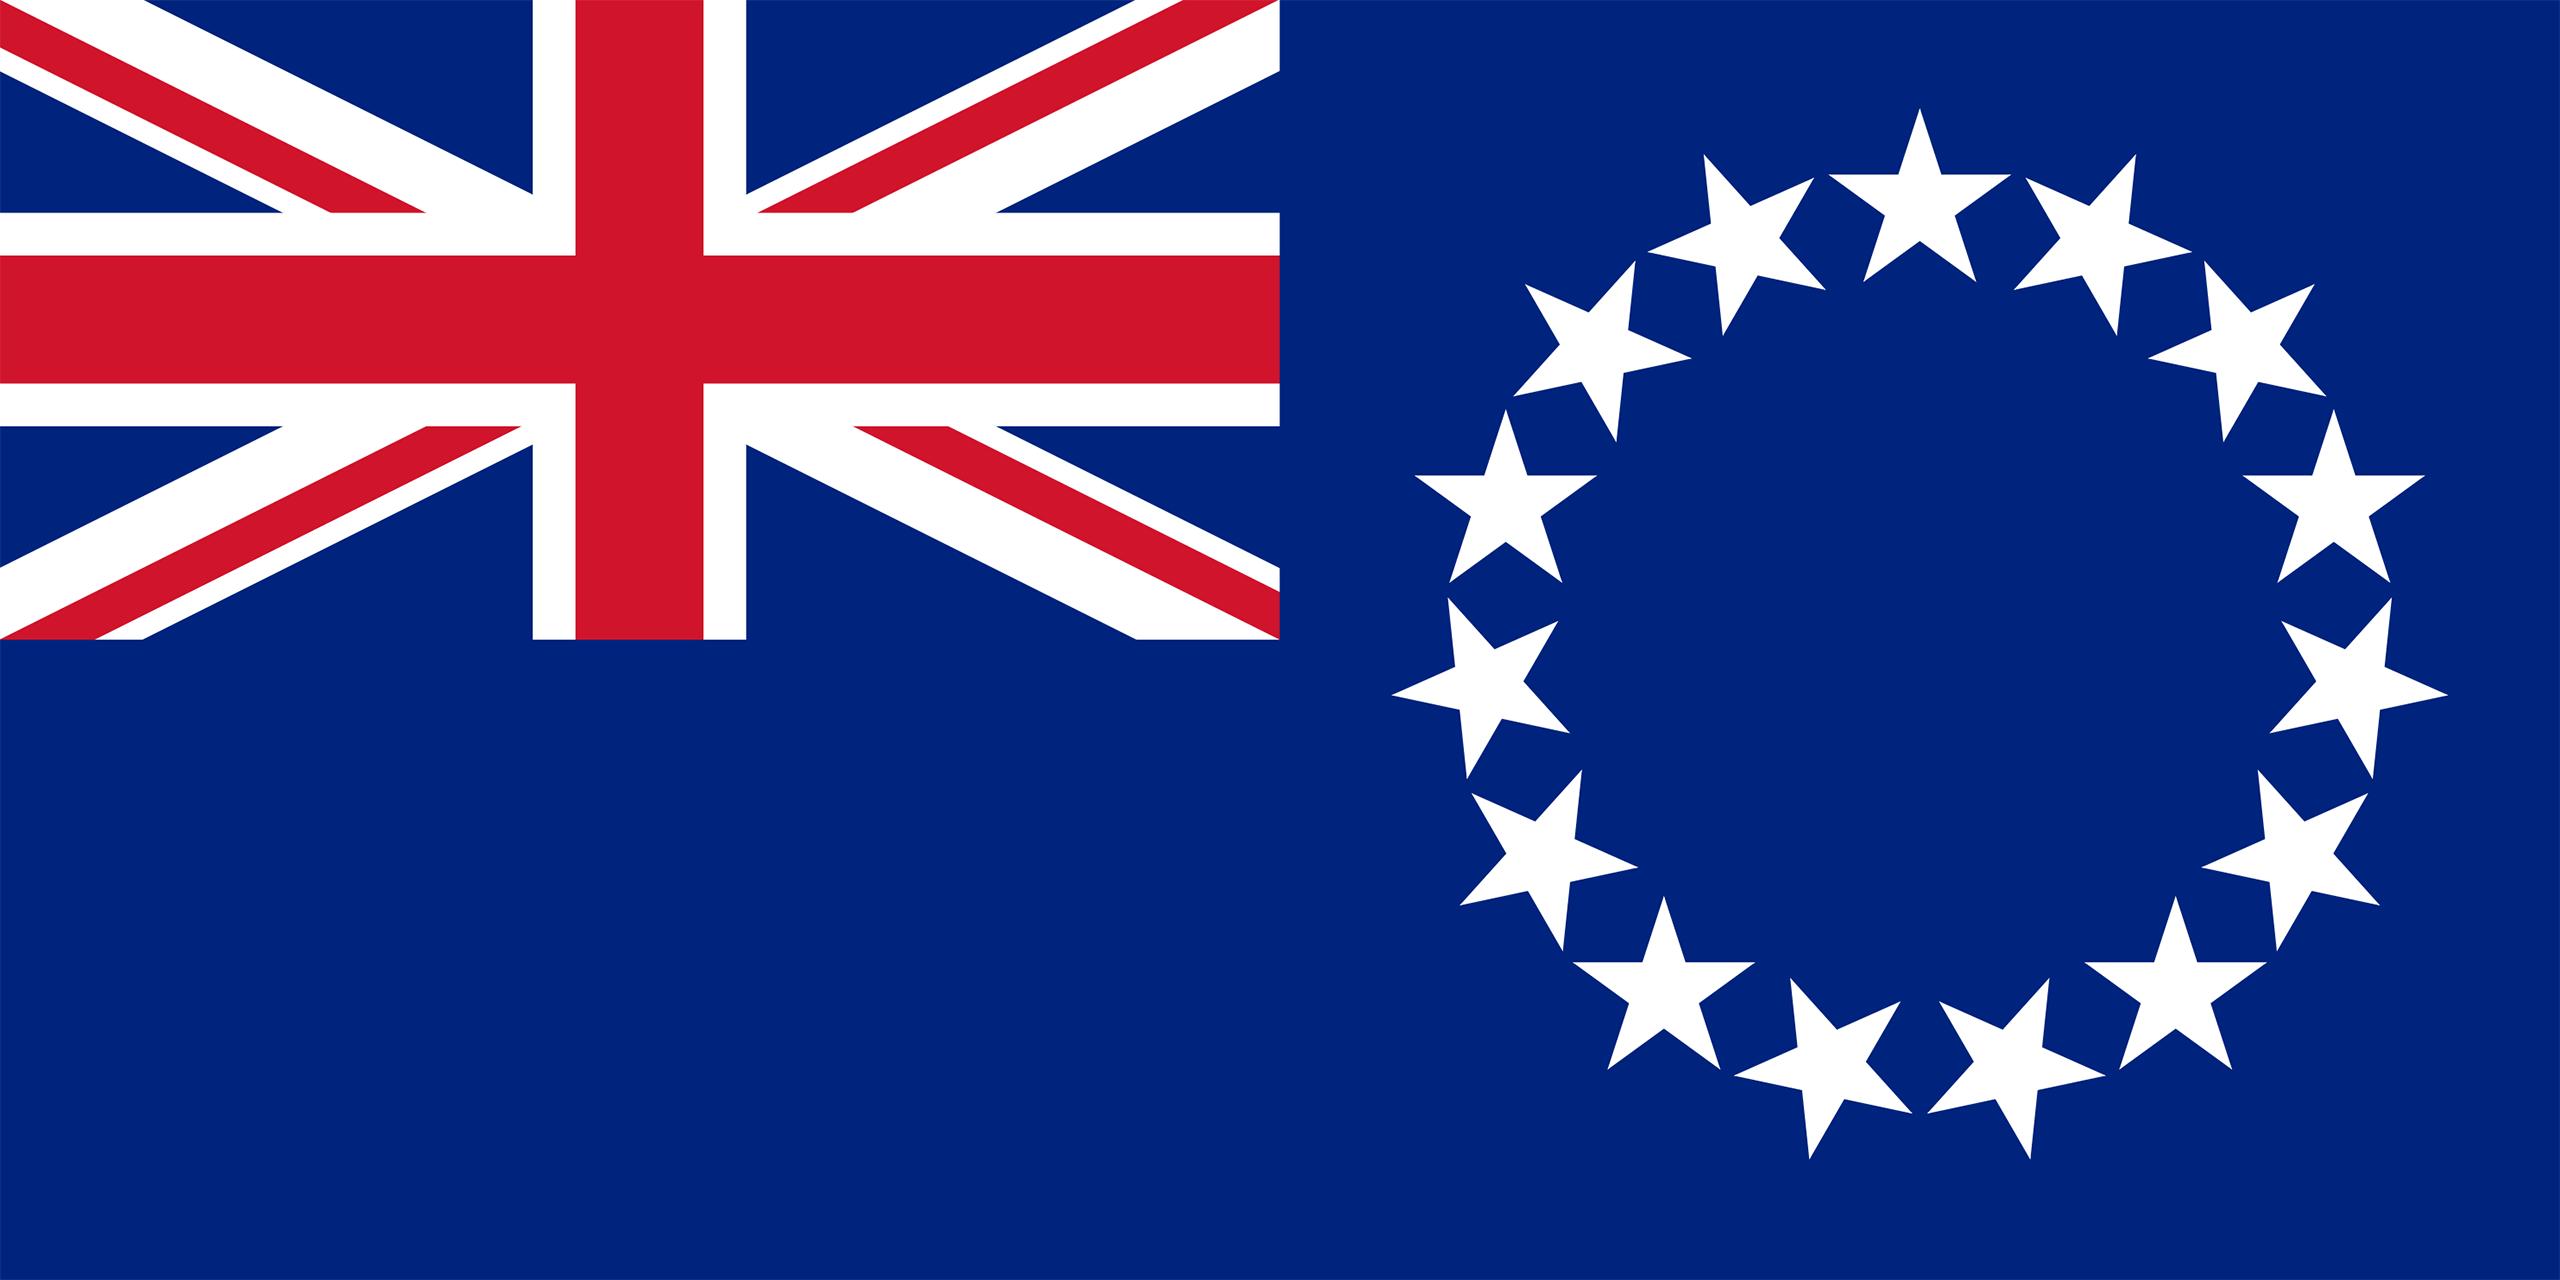 islas cook, страна, Эмблема, логотип, символ - Обои HD - Профессор falken.com